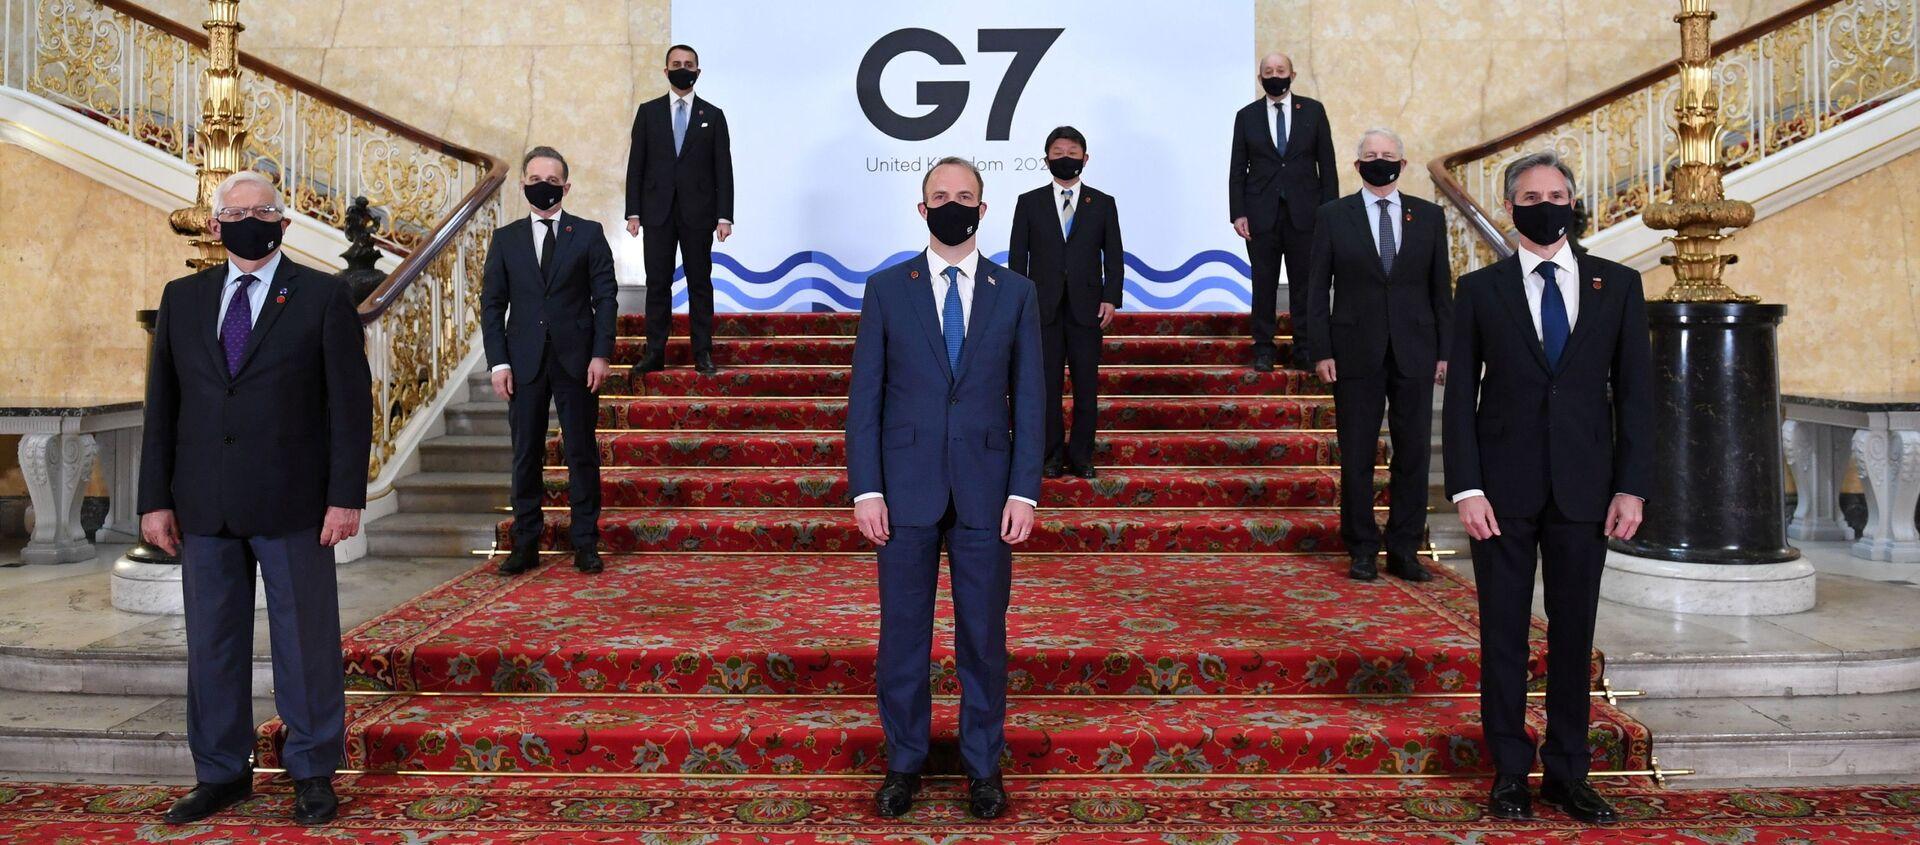 G7サミット - Sputnik 日本, 1920, 14.06.2021